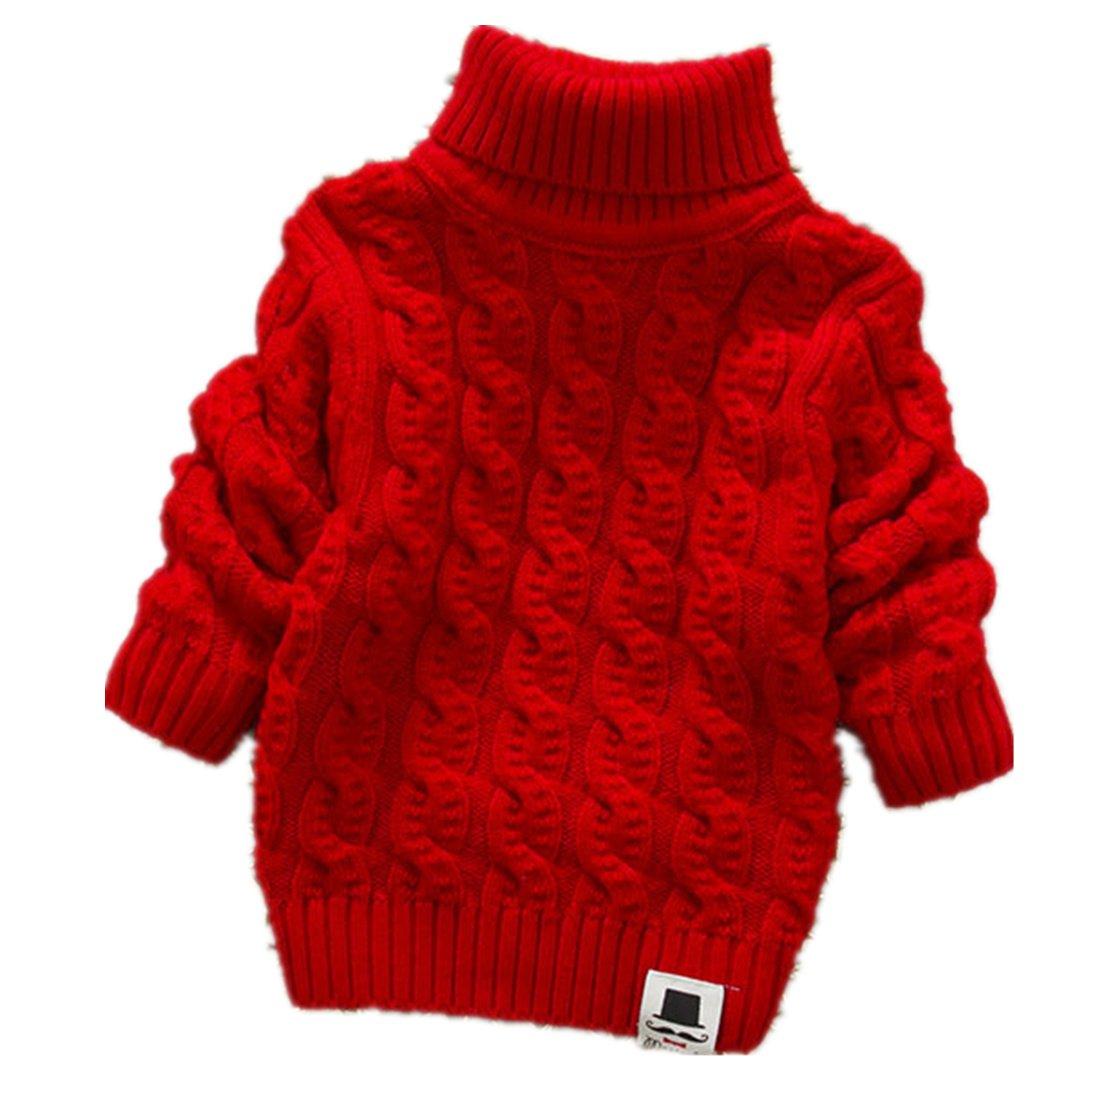 Nine Minow 5-9 Years Kids Turtleneck Sweater Boys Girls Knit Sweater Christmas